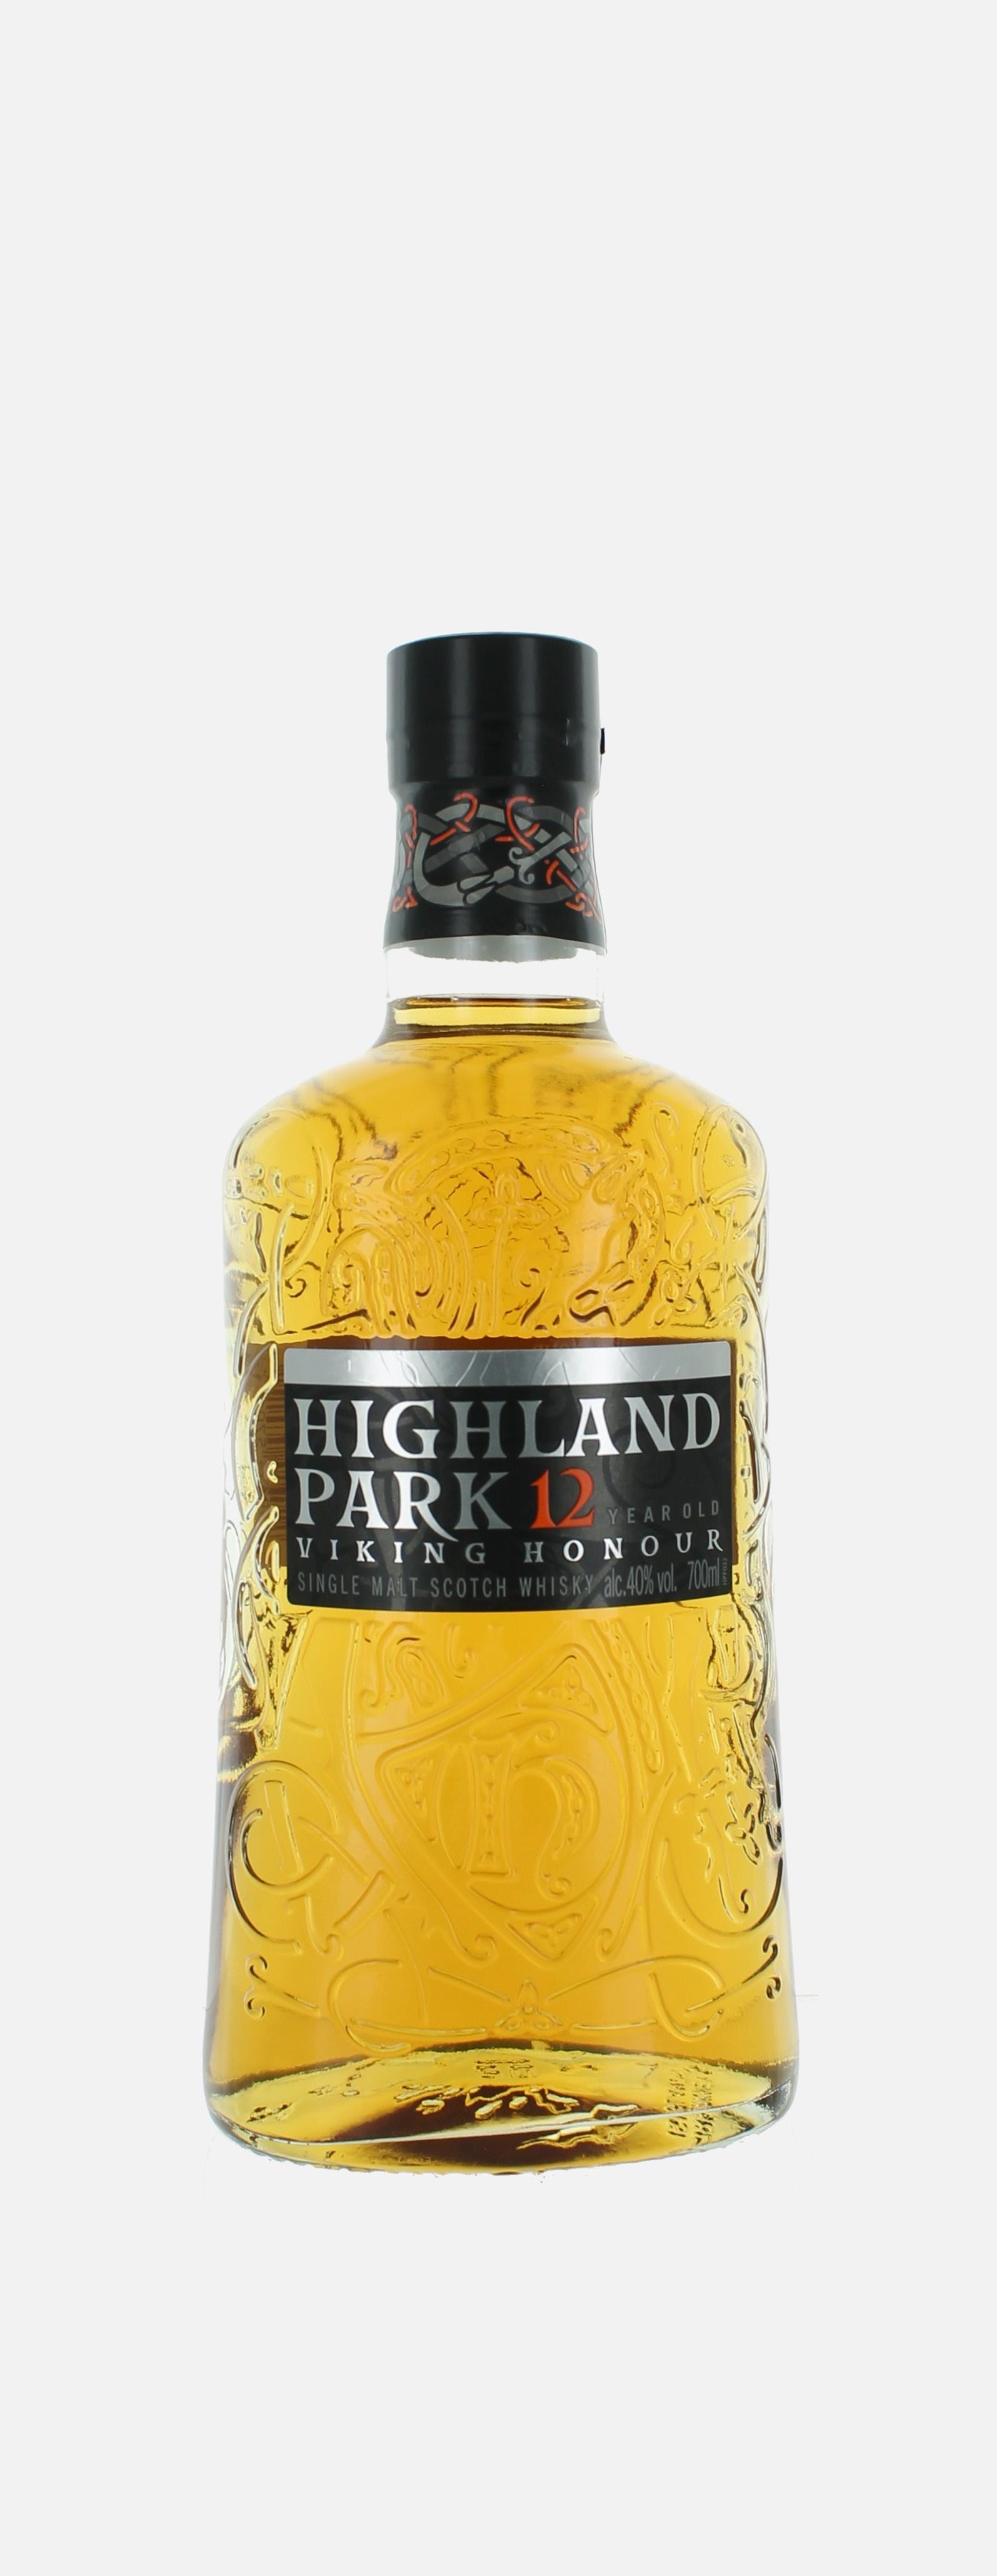 Highland Park 10 Y, Single Malt Scotch Whisky